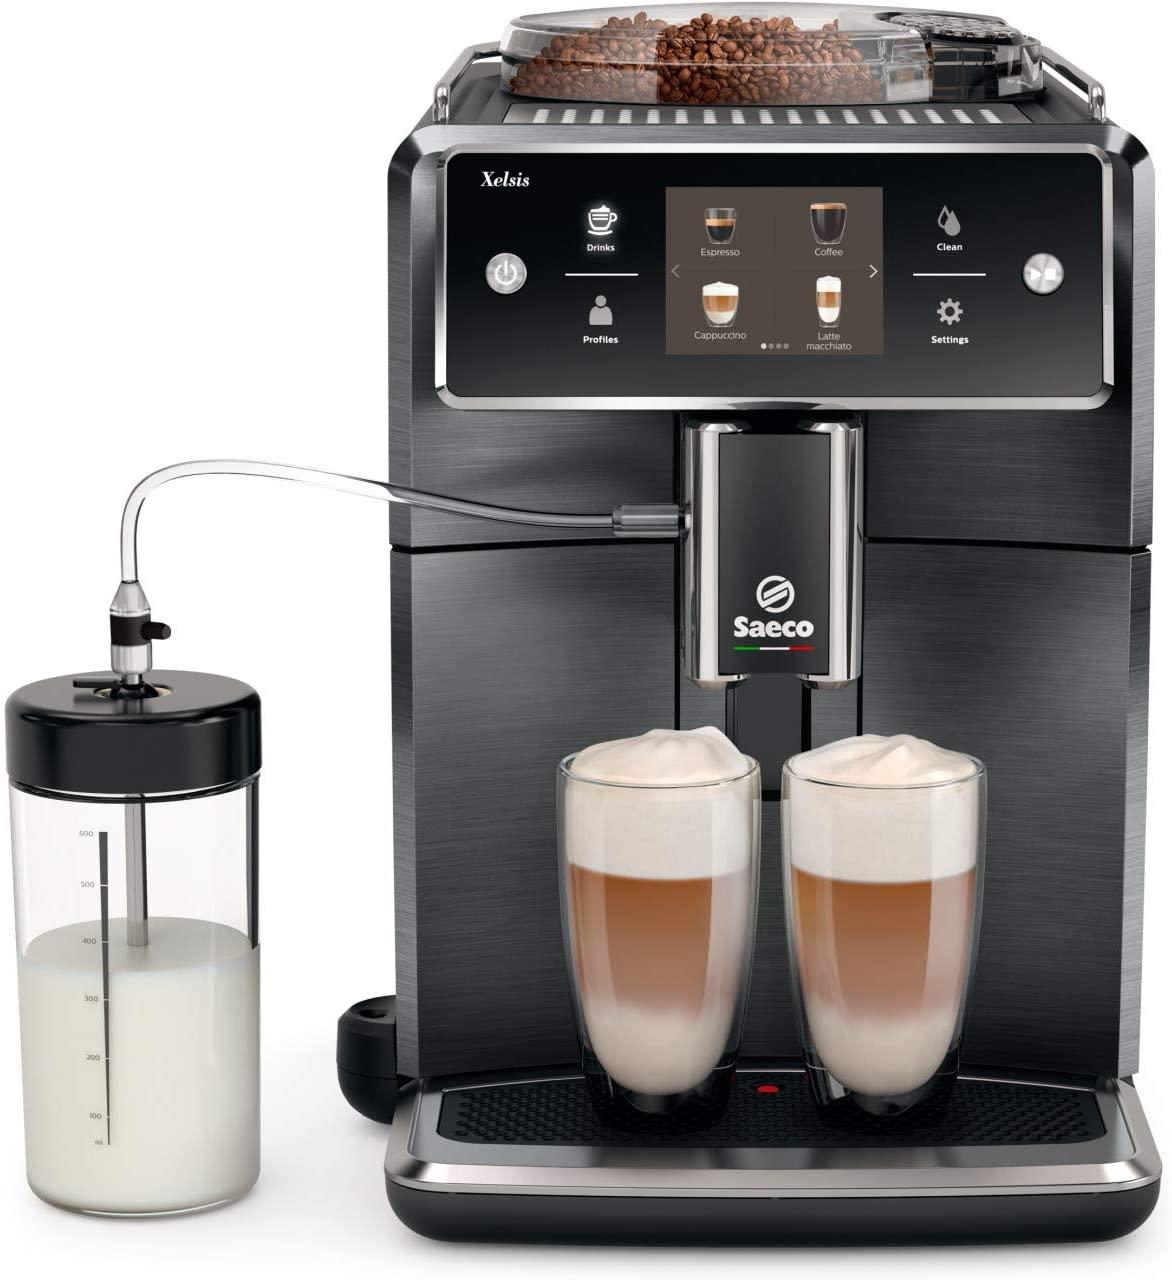 7. Saeco Xelsis Super Automatic Espresso Machine, Titanium Metal Front, SM7684/04